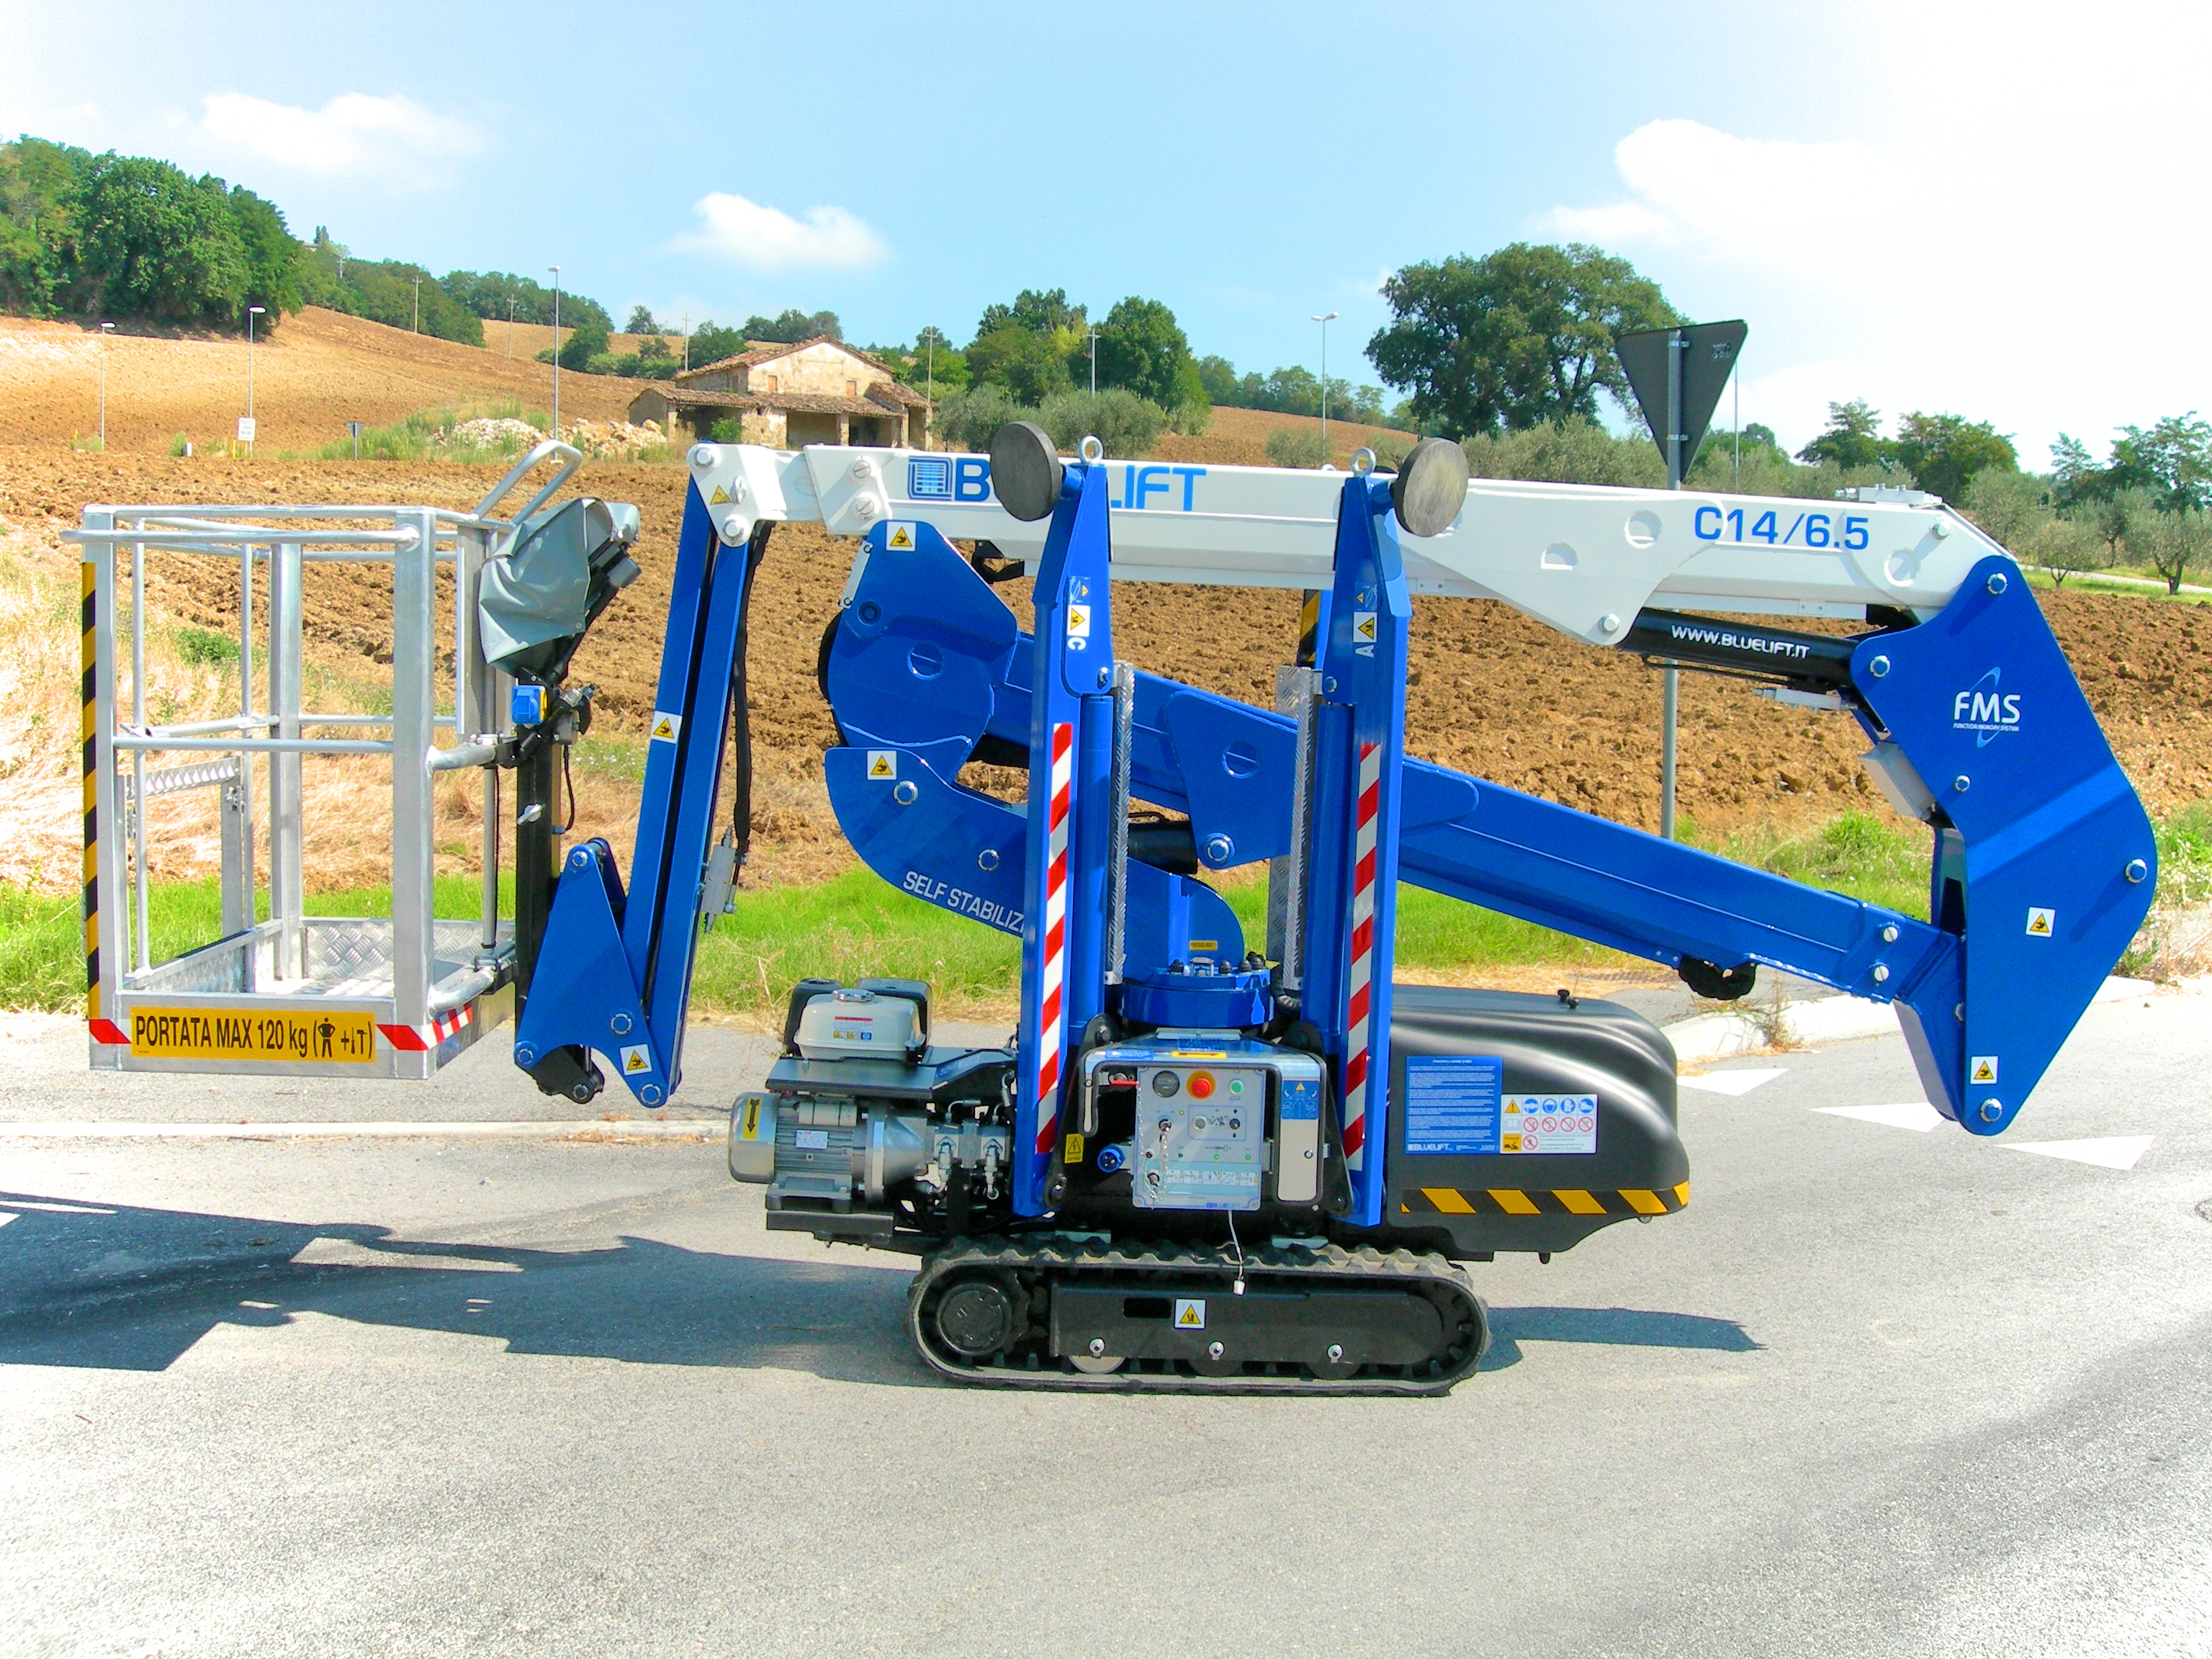 Reachmaster Bluelift B85 Reachmaster